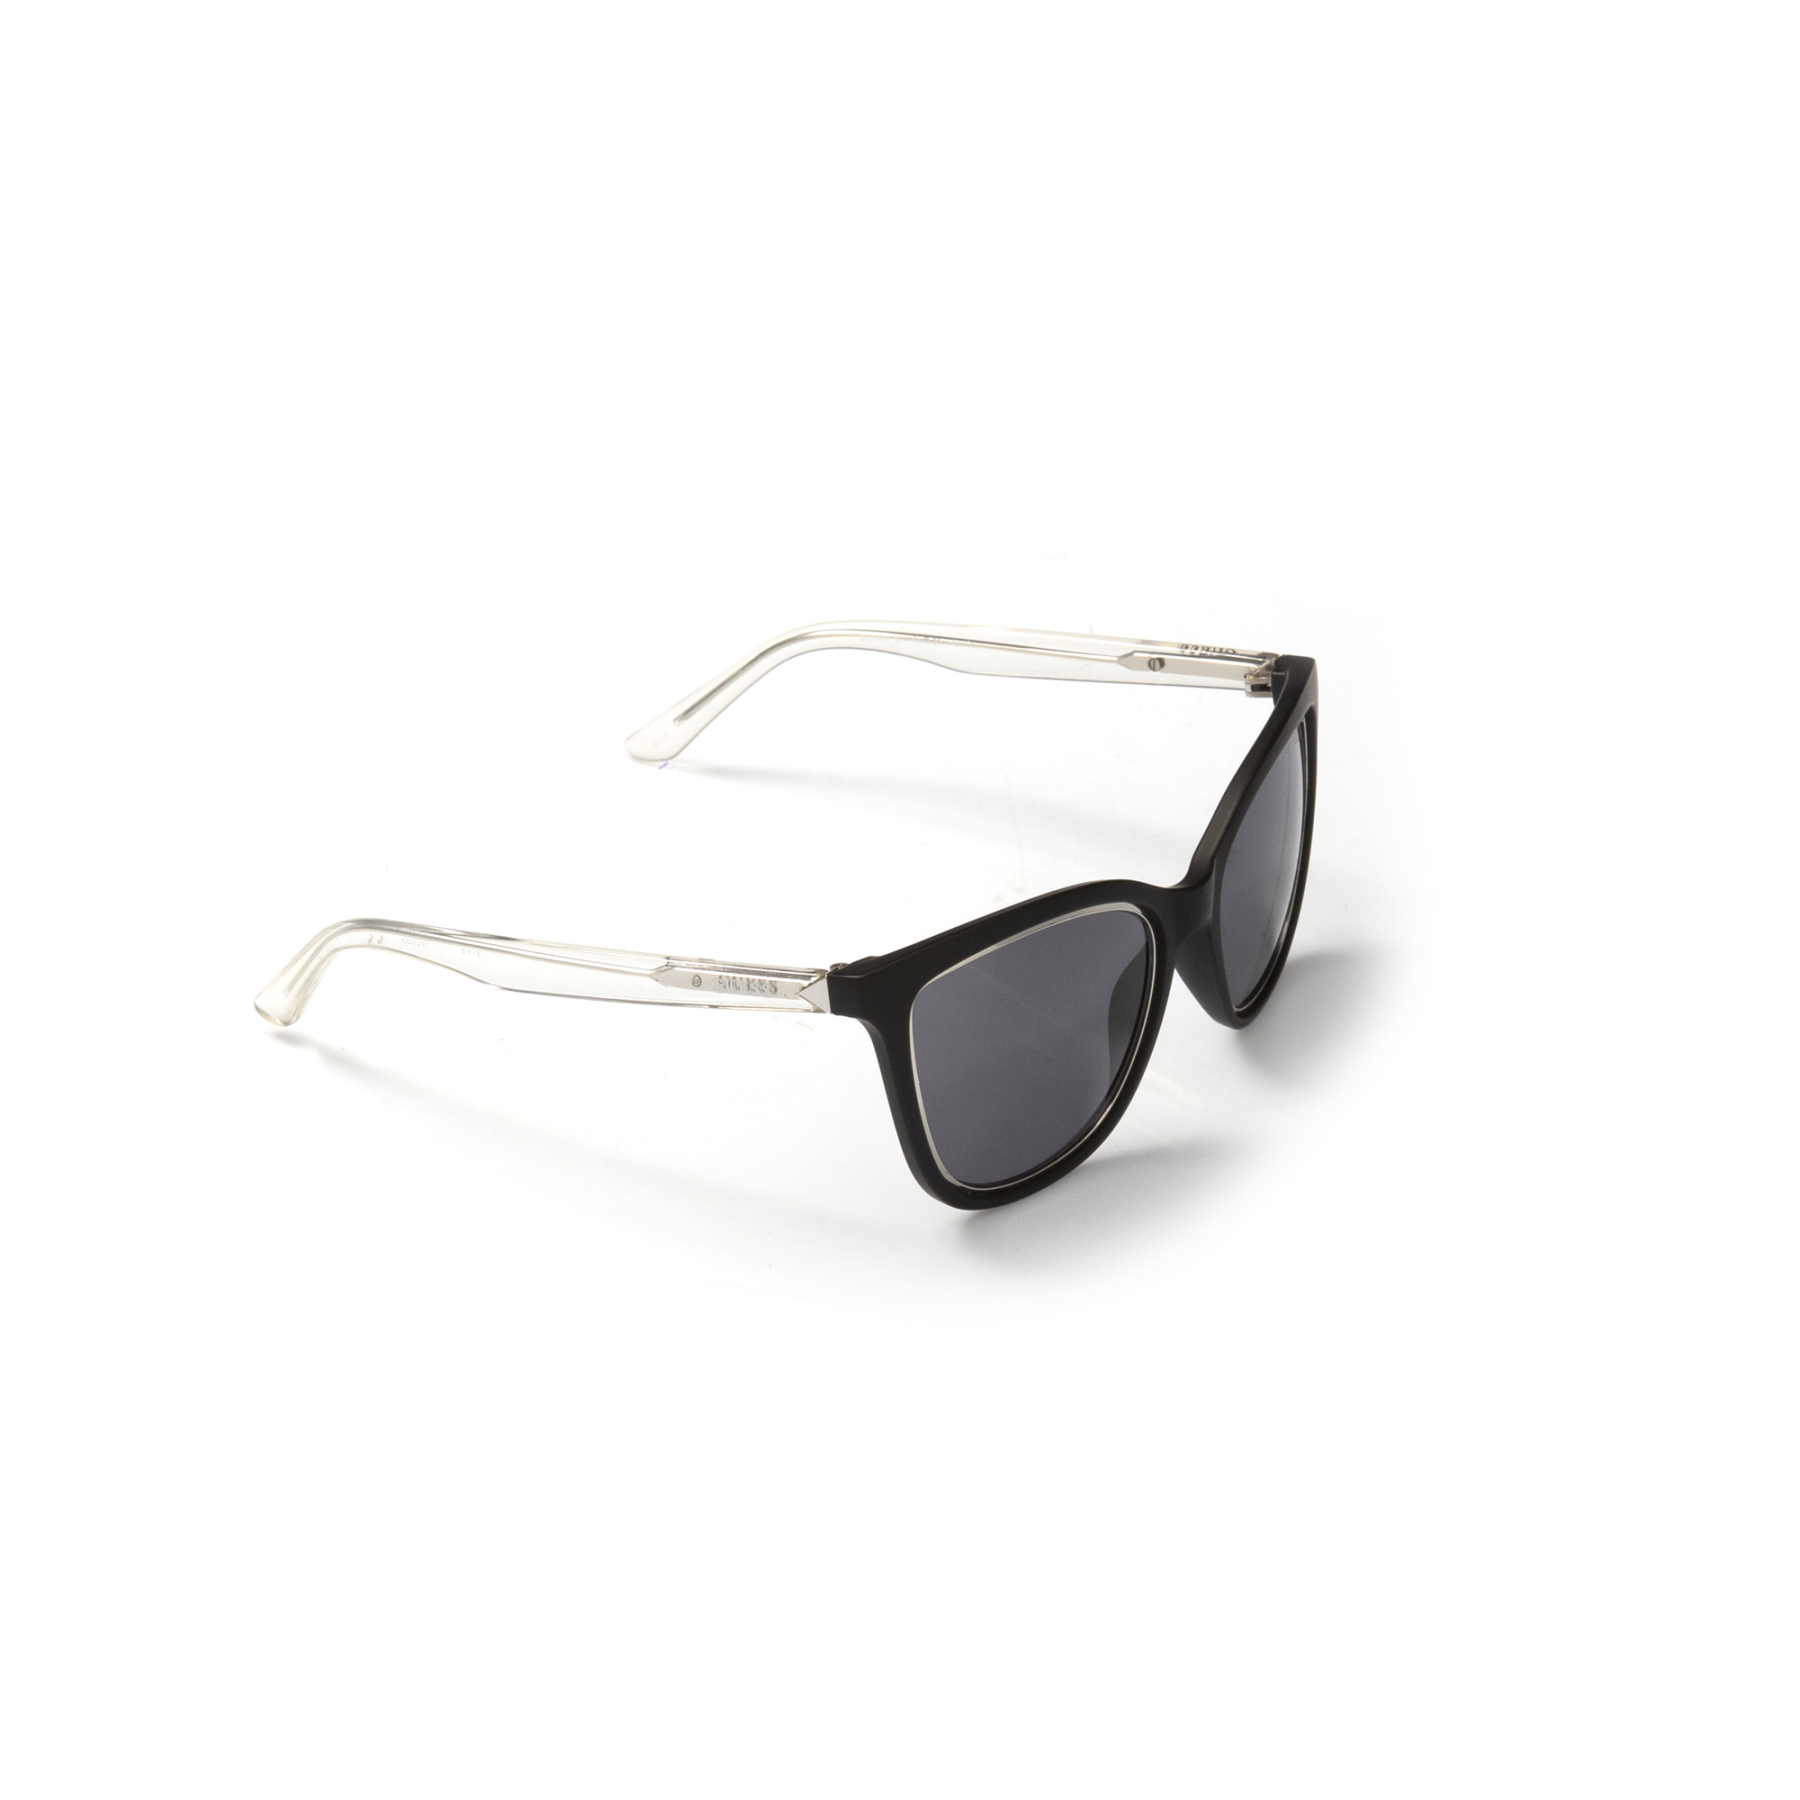 Women's sunglasses gu 7467 02a bone black organic rectangle rectangular 54-20-140 guess